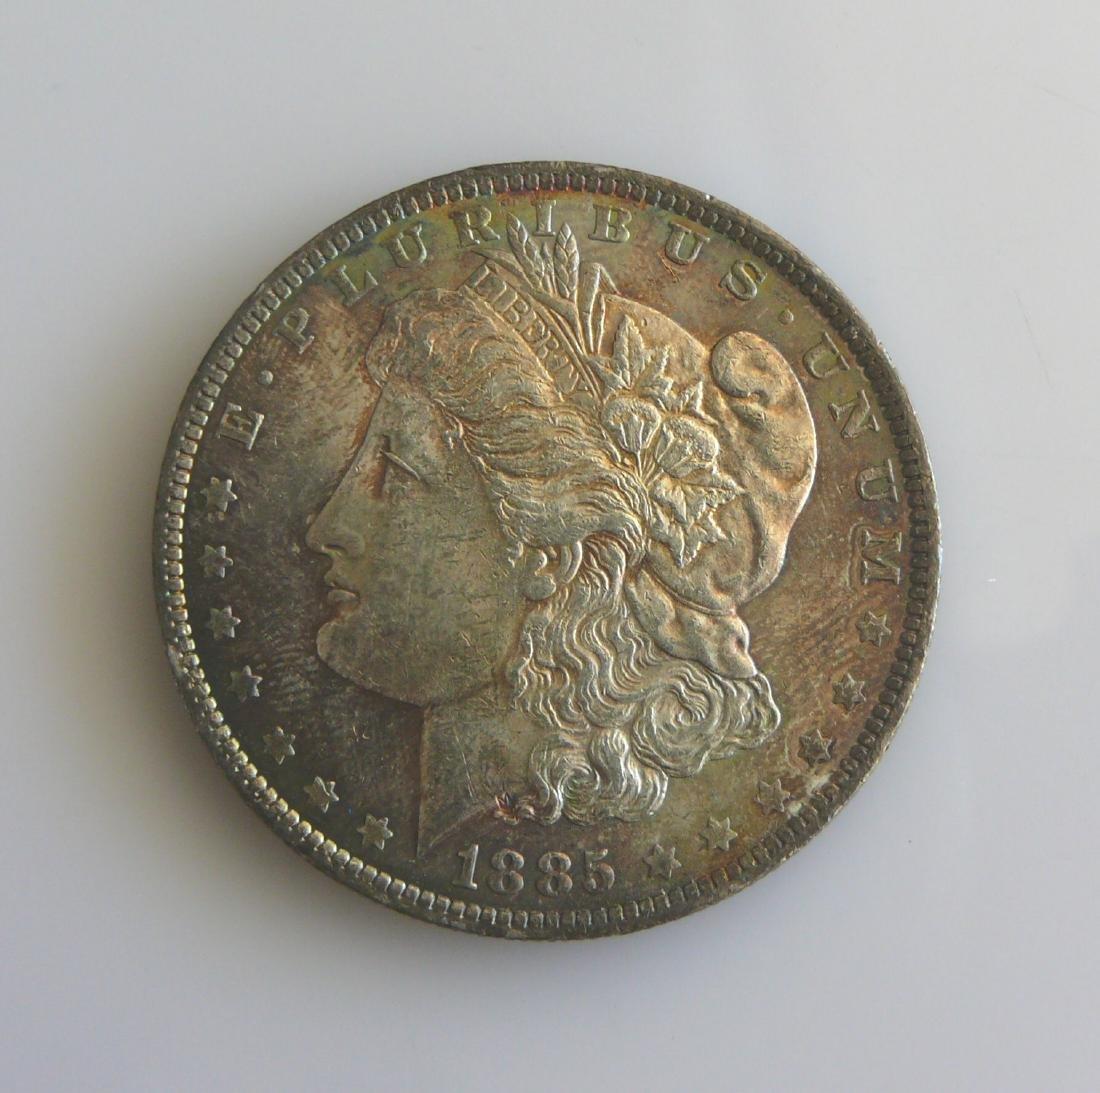 1885 O Gem Uncirculated Rainbow Toned Morgan Silver